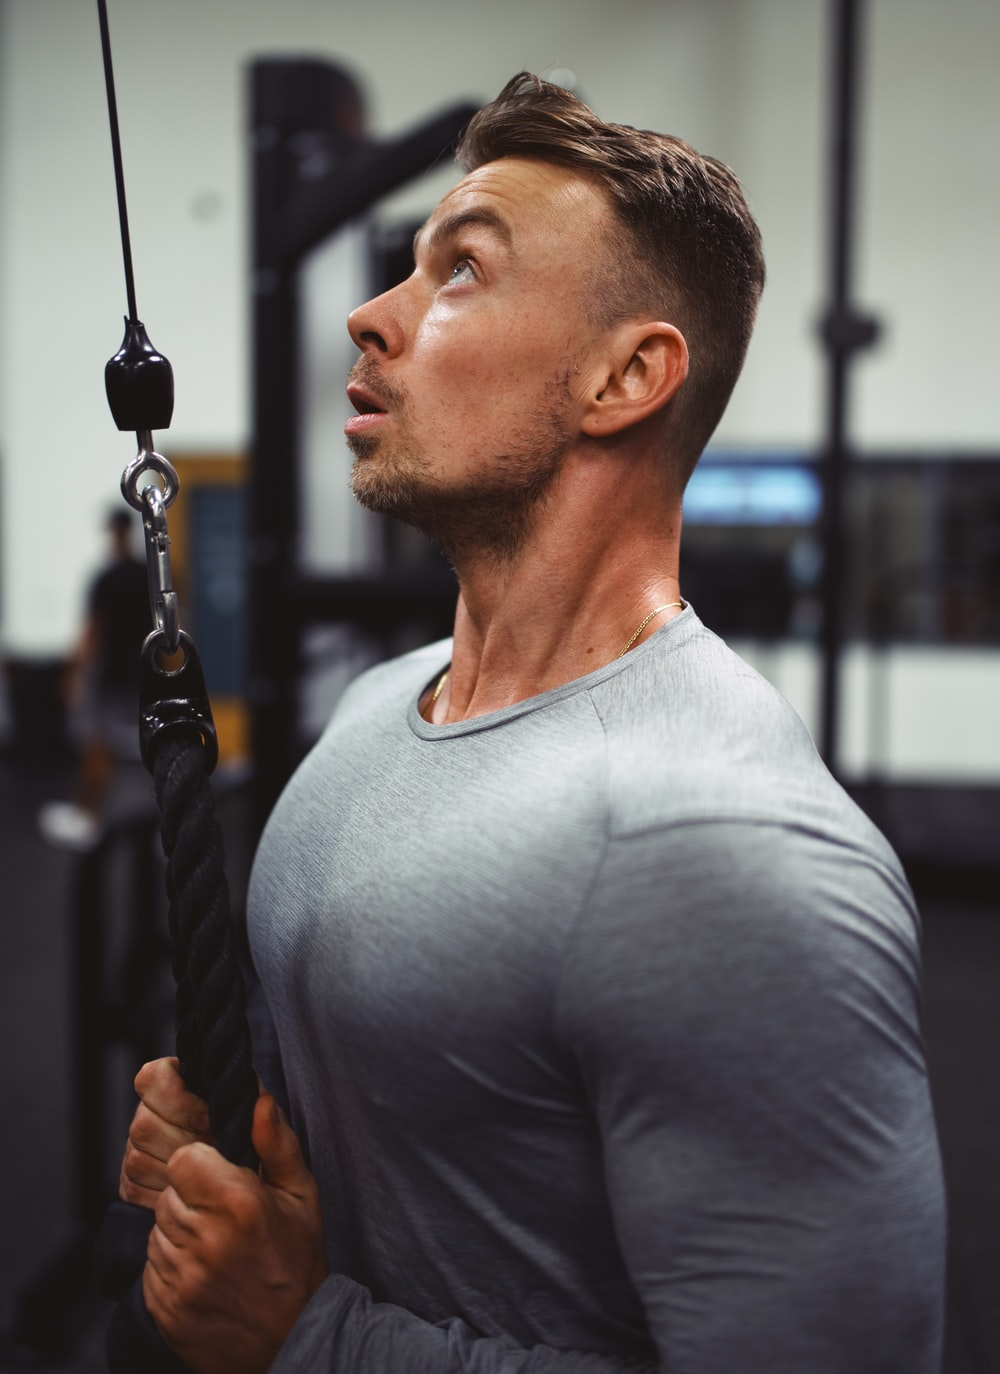 man in gray crew neck shirt holding black rope